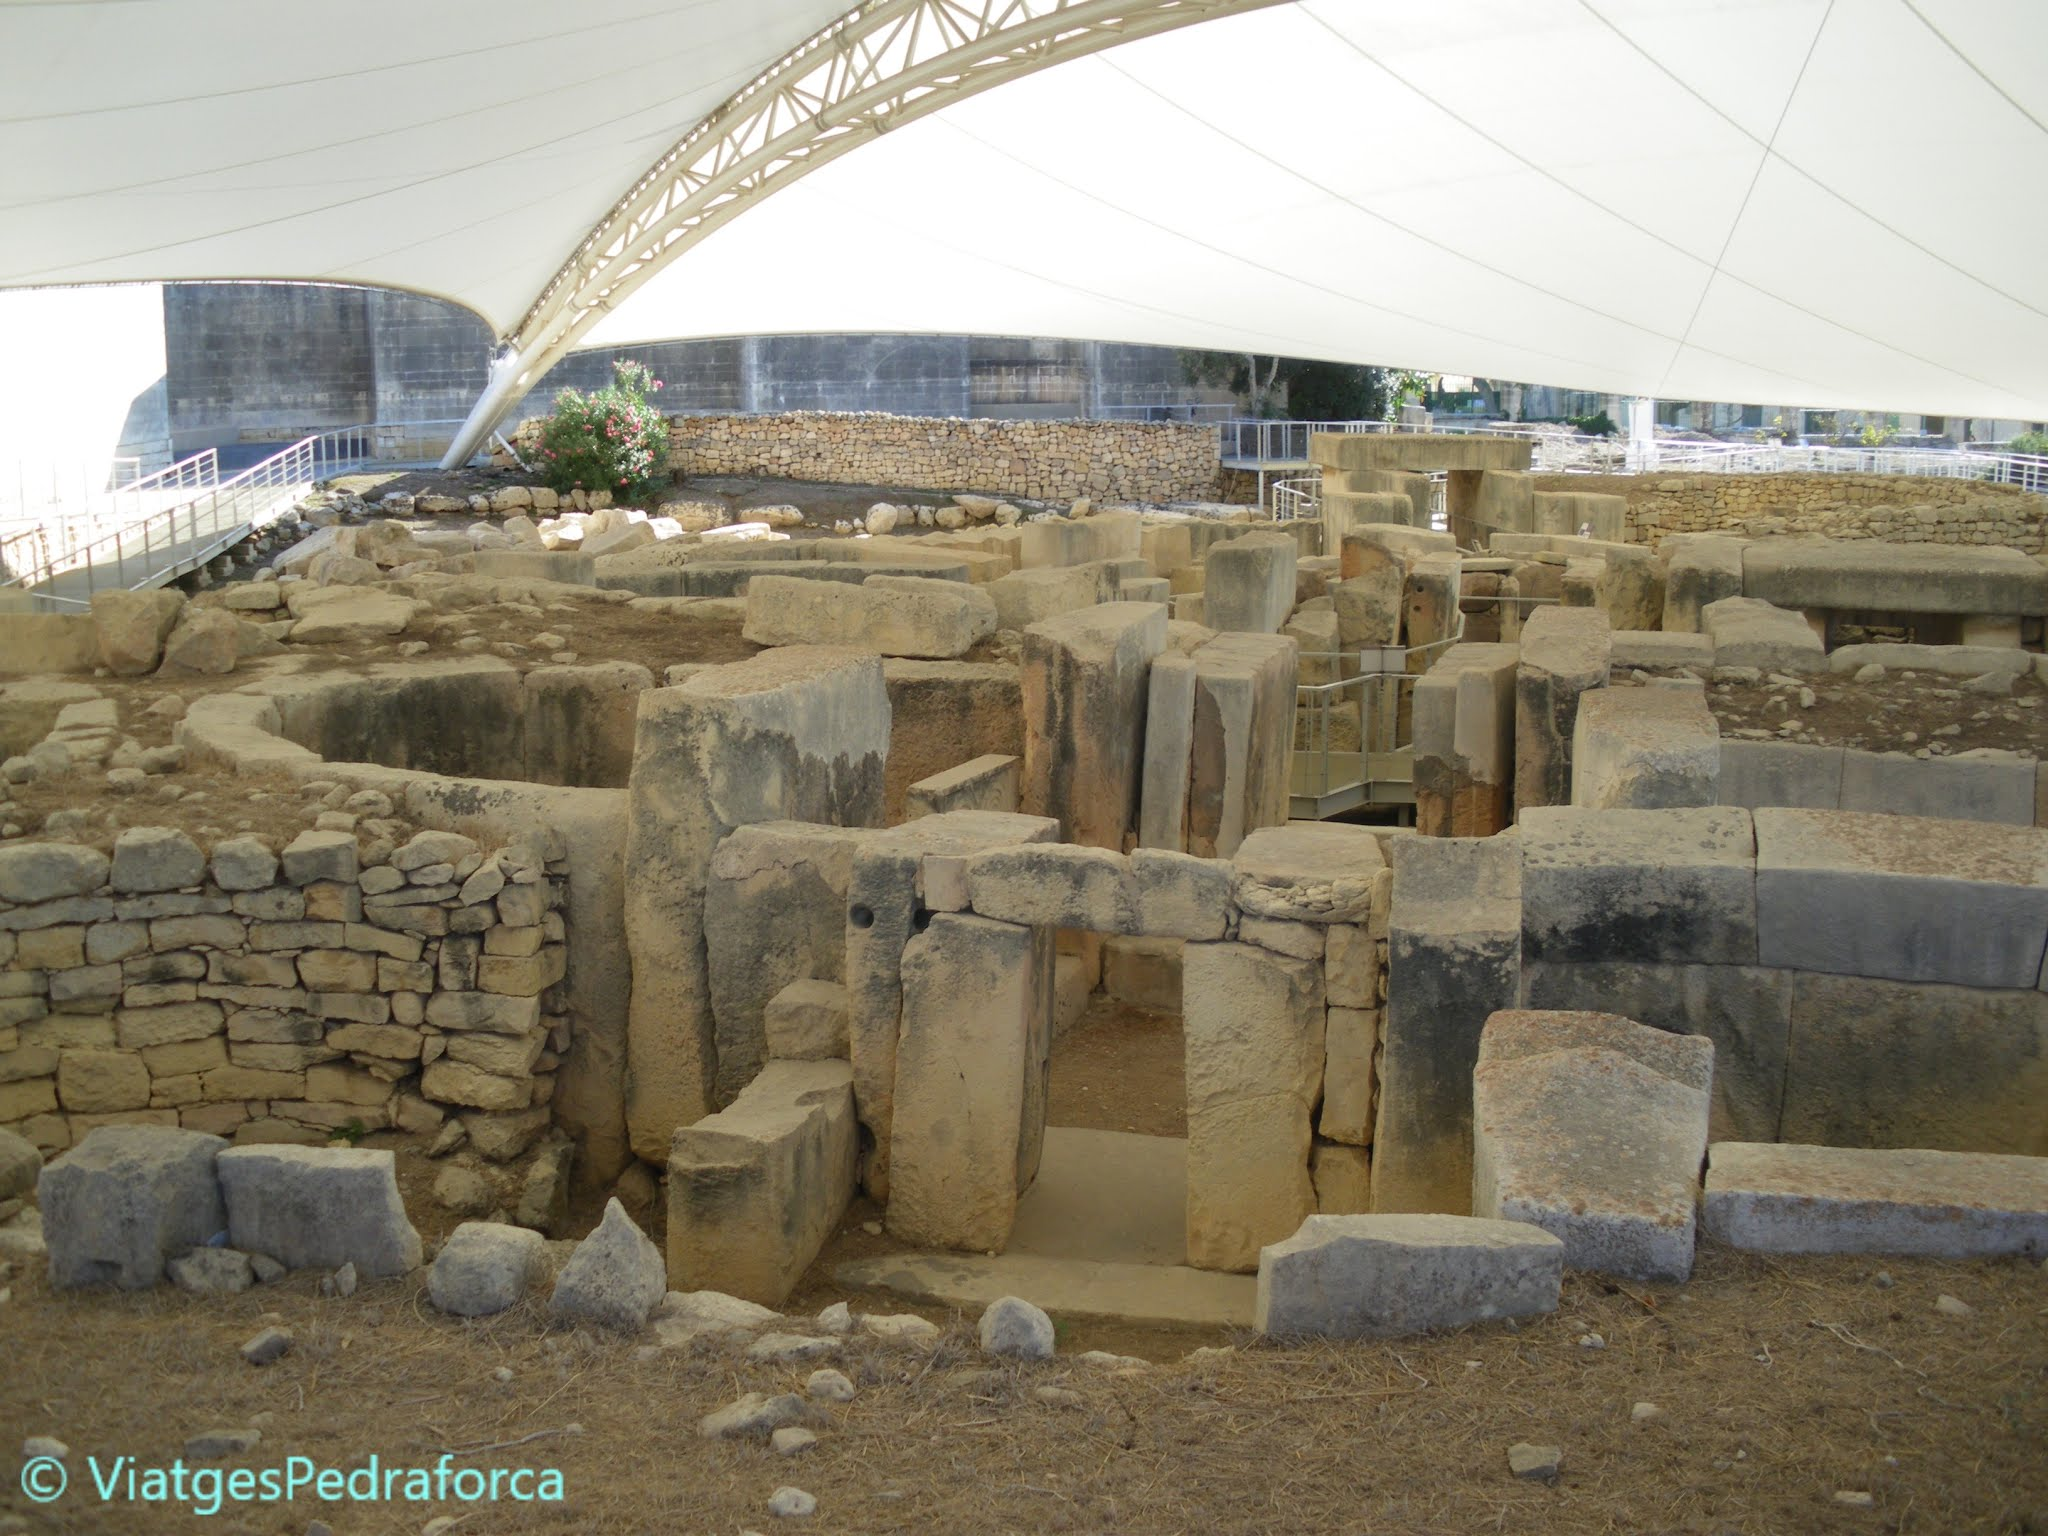 Patrimoni de la Humanitat, Unesco, World Heritage, Arqueologia